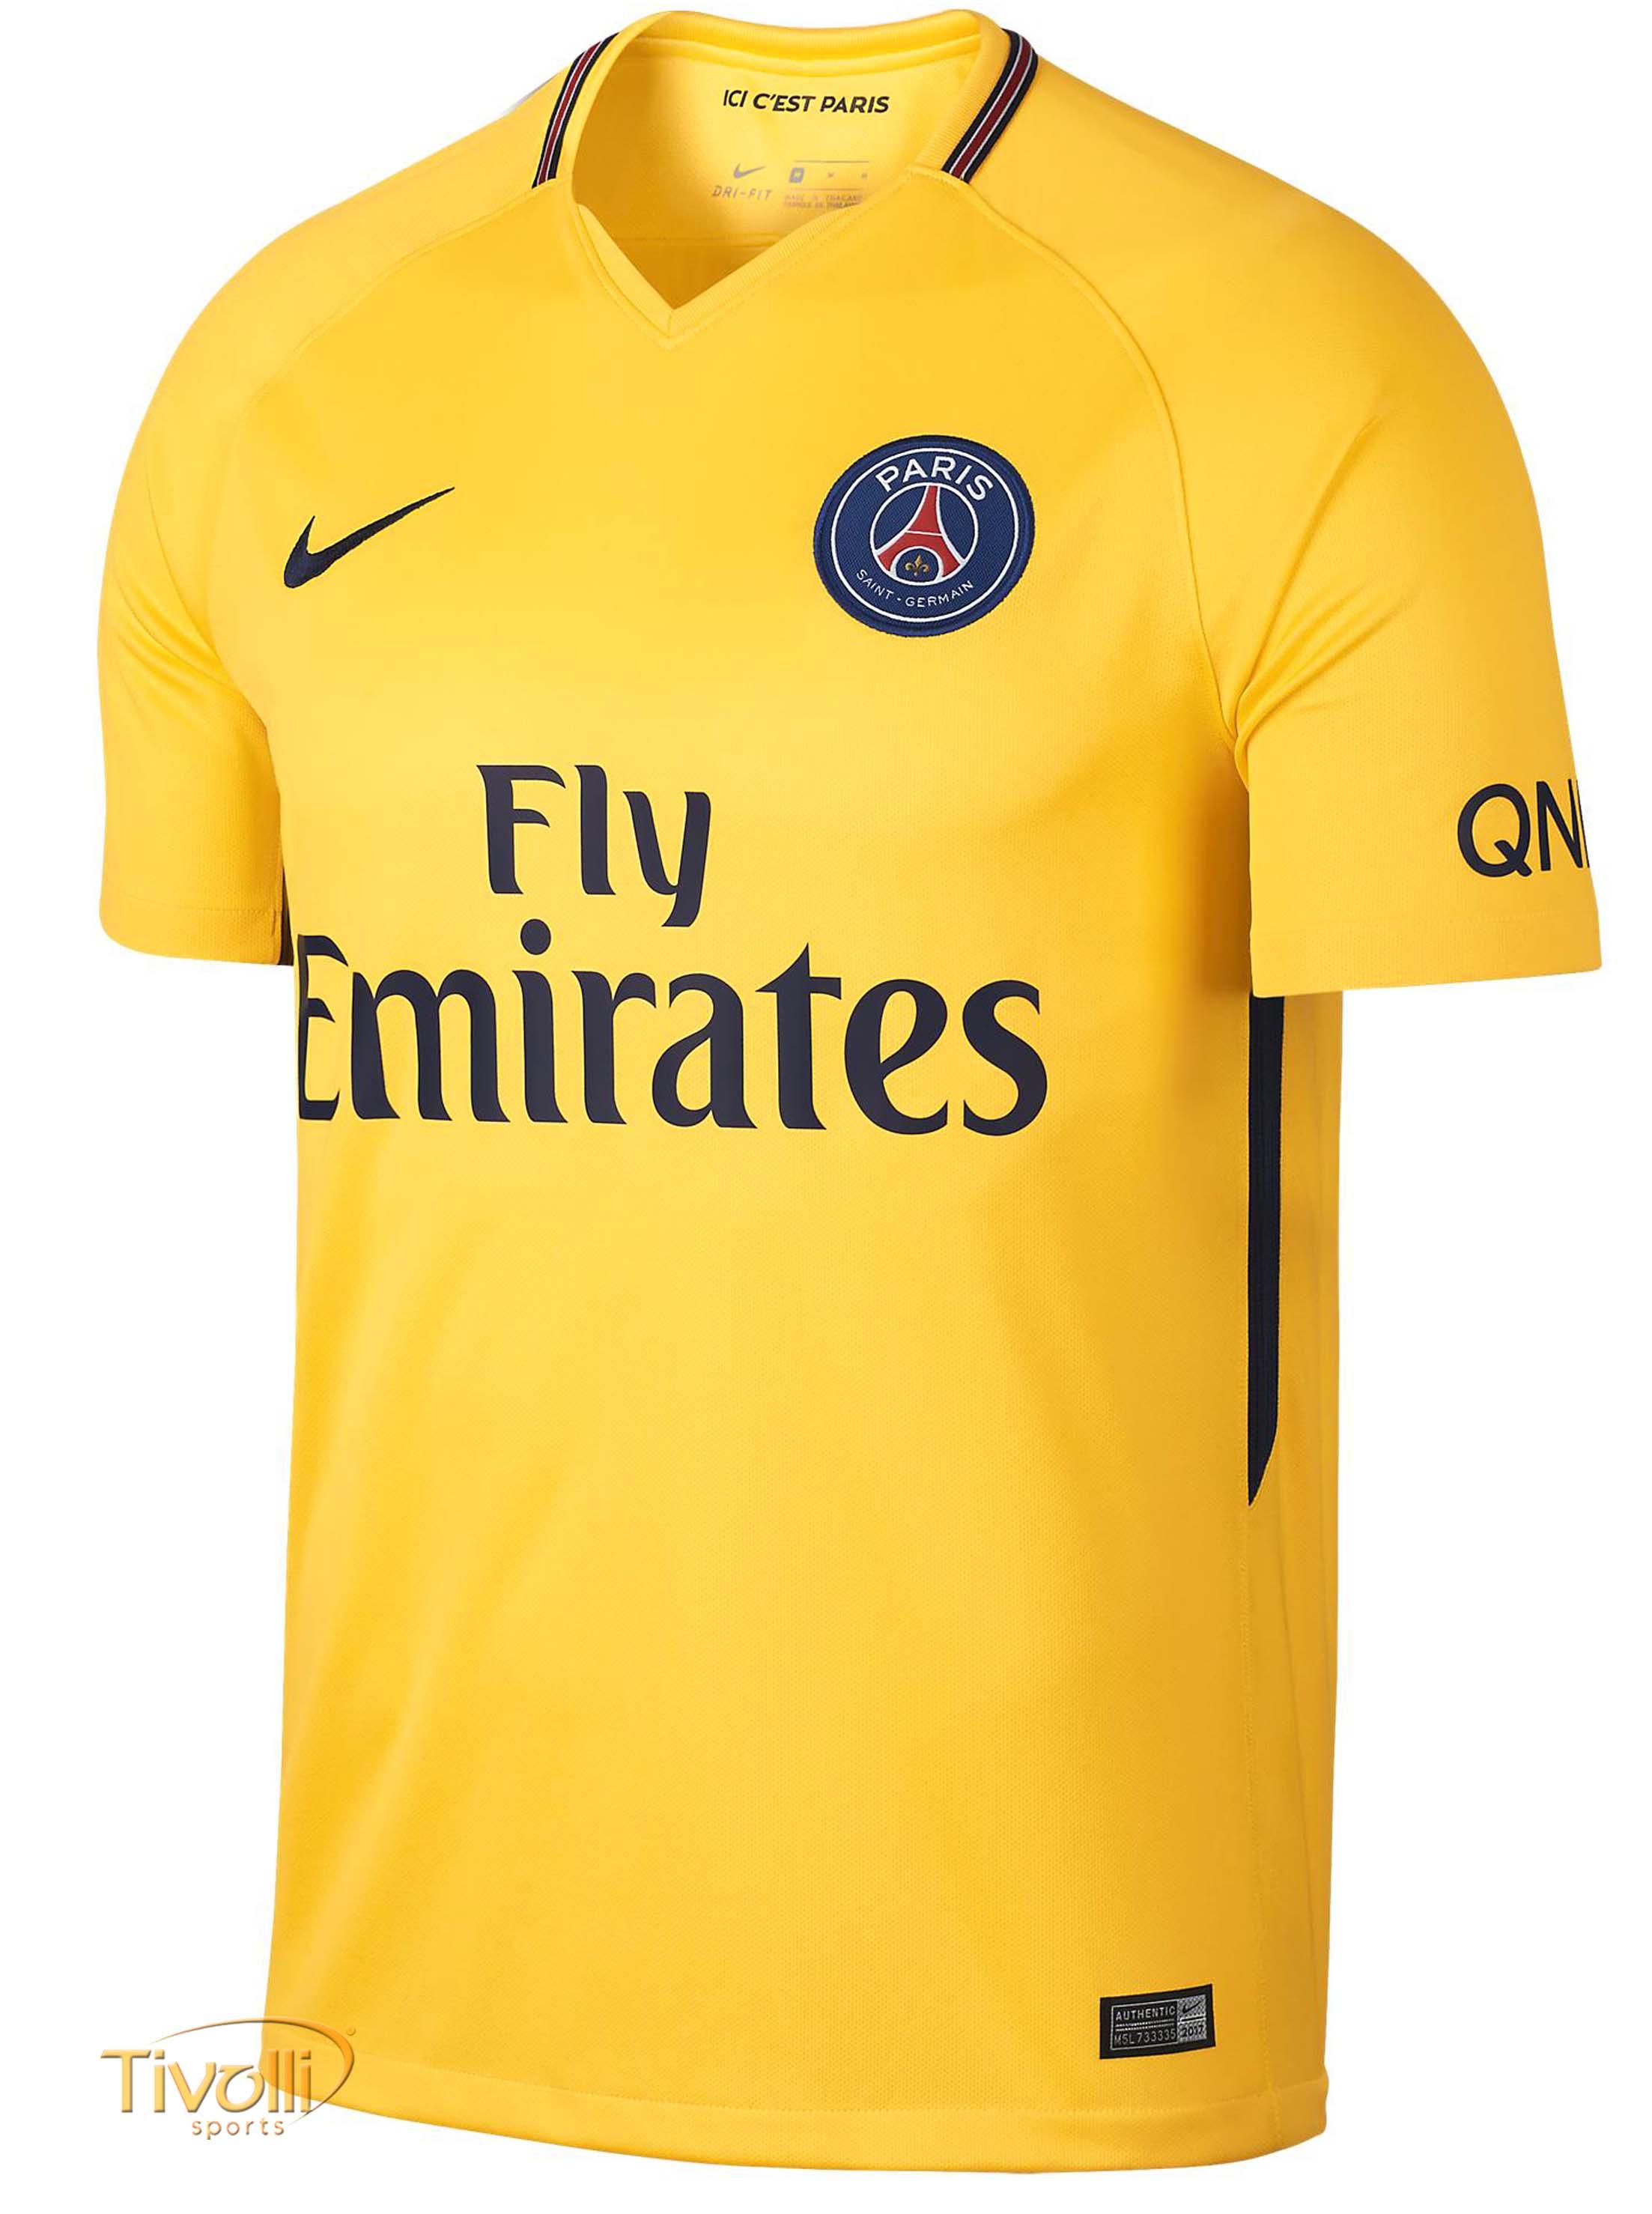 04581ccbb011c Camisa Paris Saint-Germain PSG 2017 2018 II Away Nike. - Mega Saldão